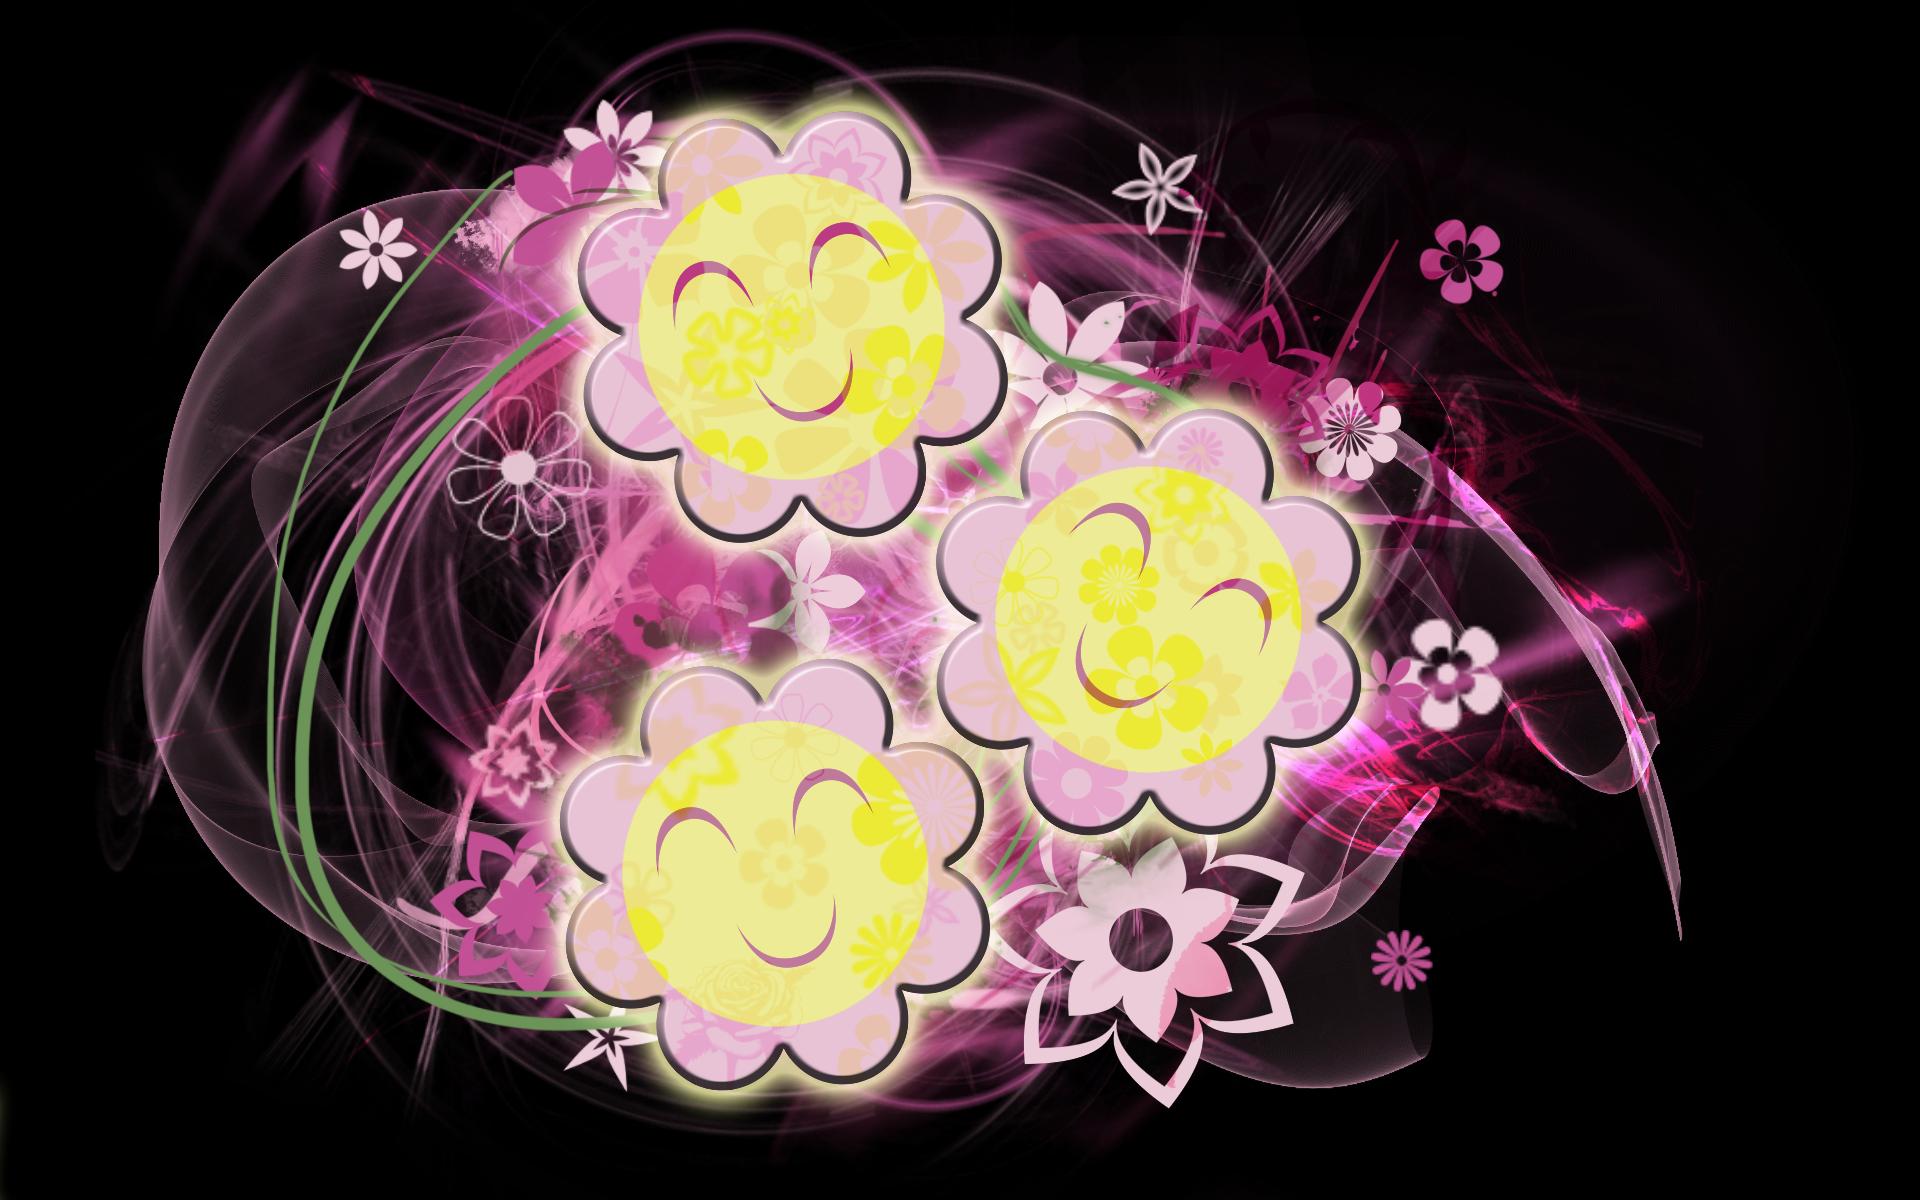 Cheerilee's Flowers by tvolcom322